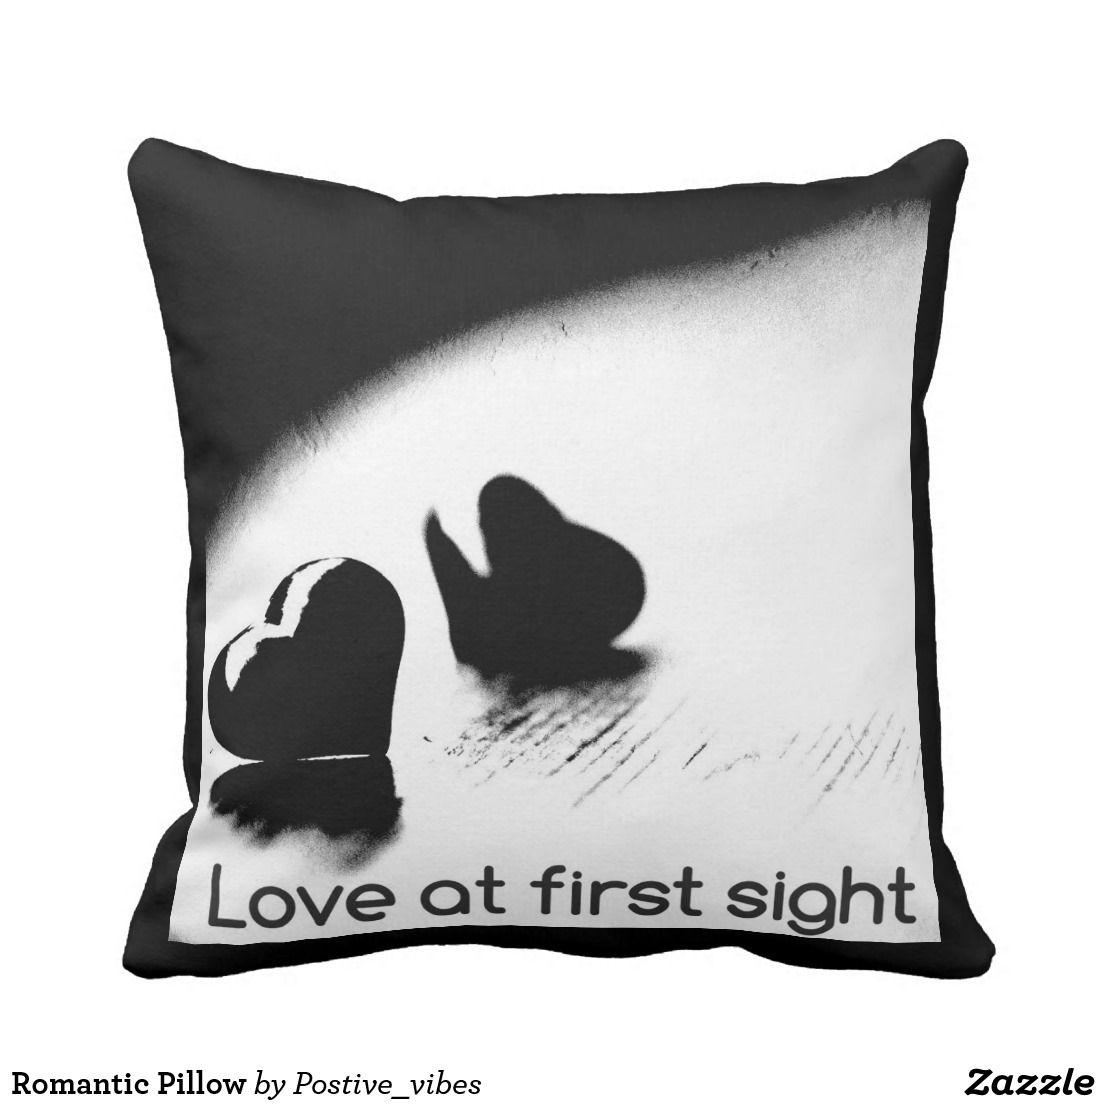 Sentimental Wedding Gift Ideas: Romantic Pillow, Sentimental Gifts